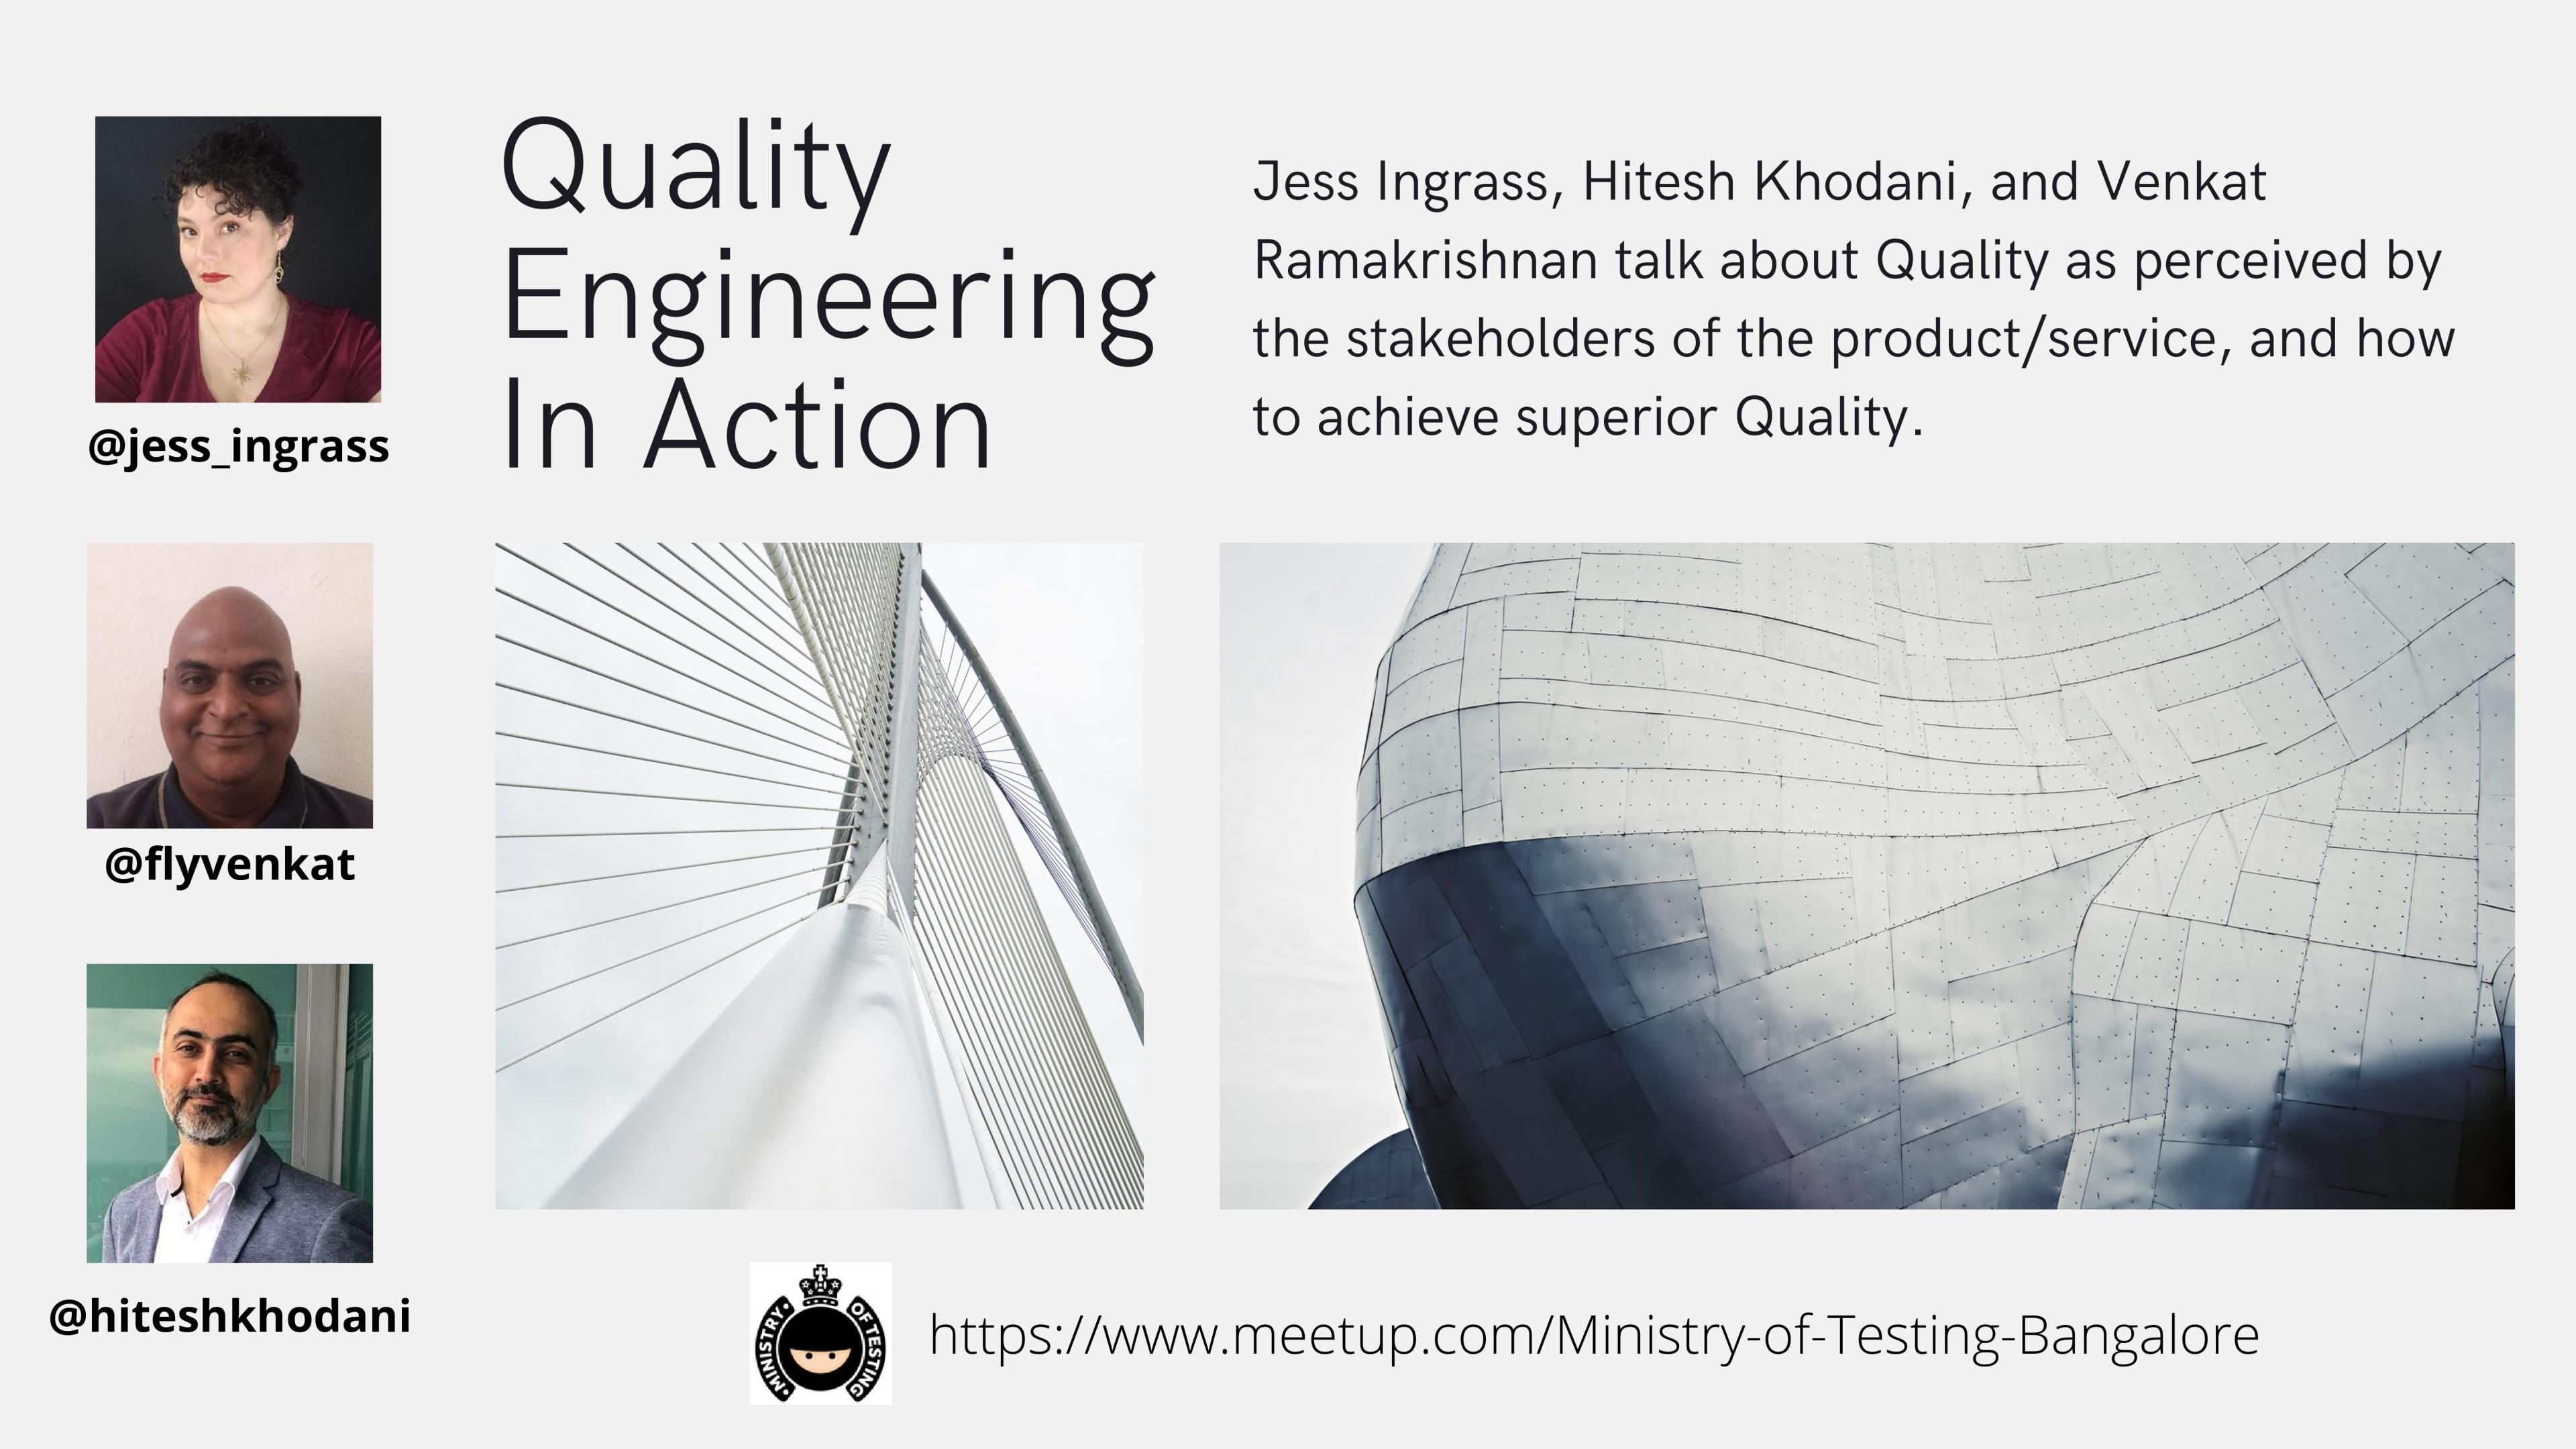 Quality Engineering in Action with Jess Ingrassellino, Hitesh Khodani and Venkat Ramakrishnan